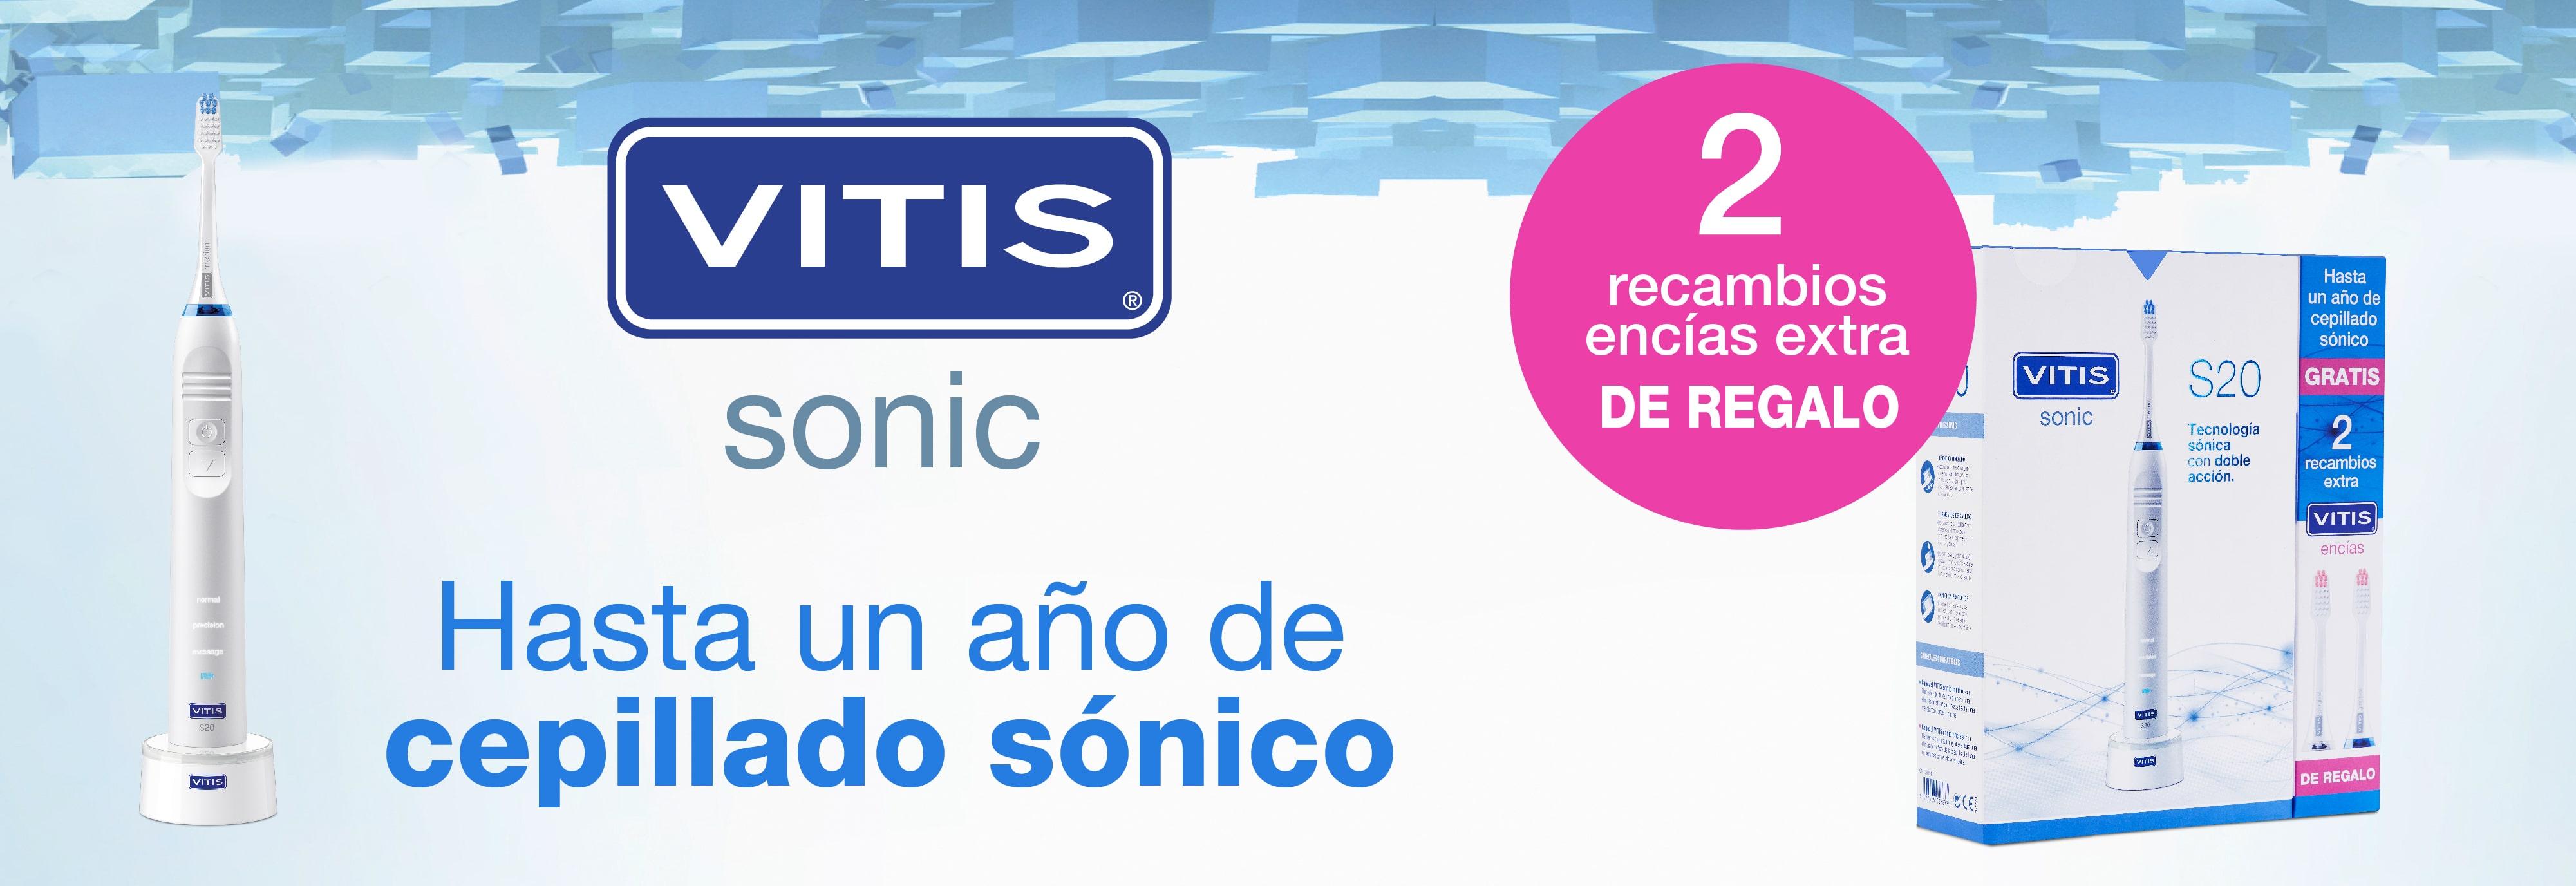 RRSS-display-pack-promo-recambio-sonic-03-min